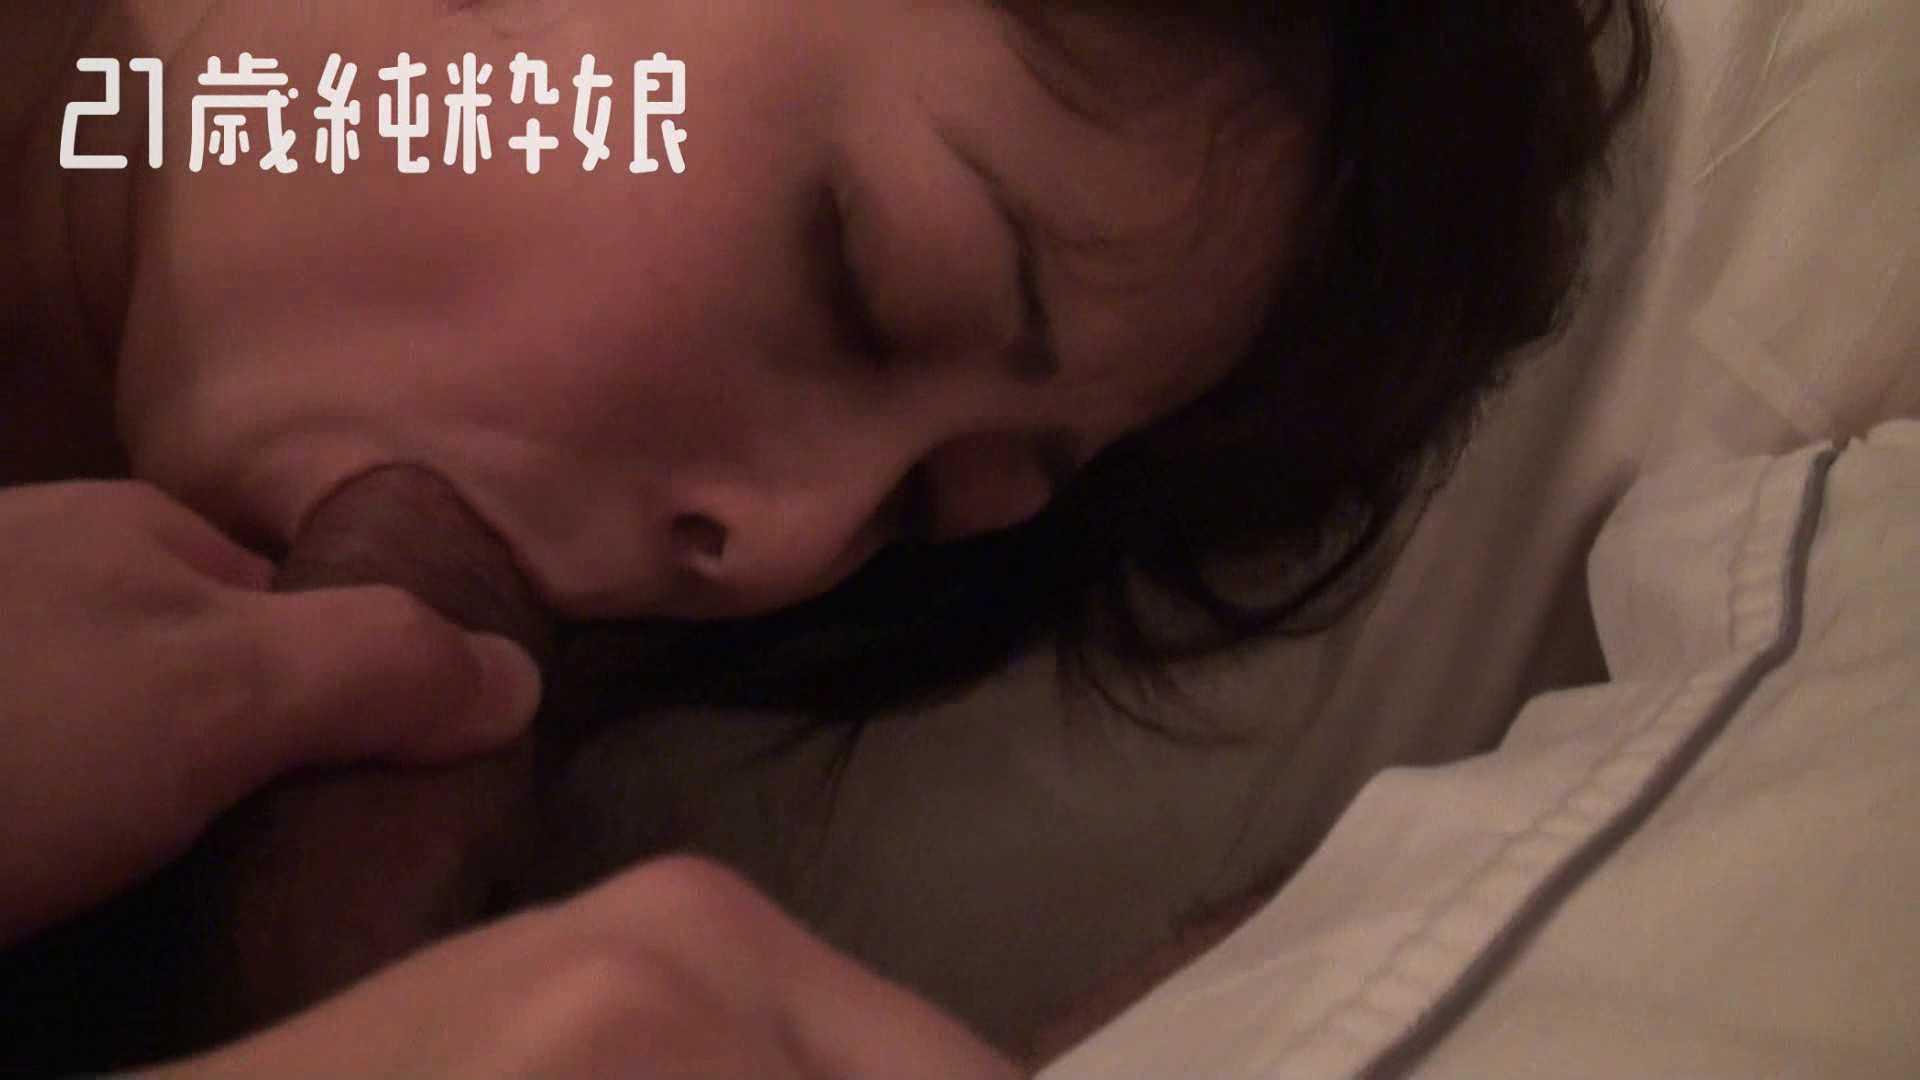 Gカップ21歳純粋嬢第2弾Vol.4 学校 | OLヌード天国  65PIX 65